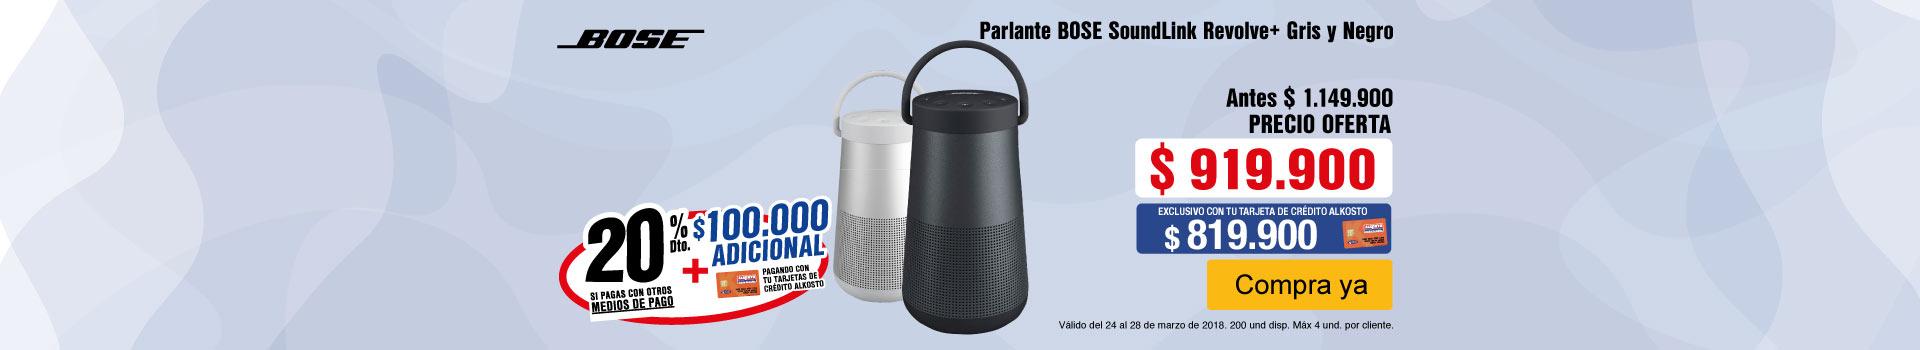 CAT-1-audio-BoseSLRevolve+-prod-<Marzo 24-27